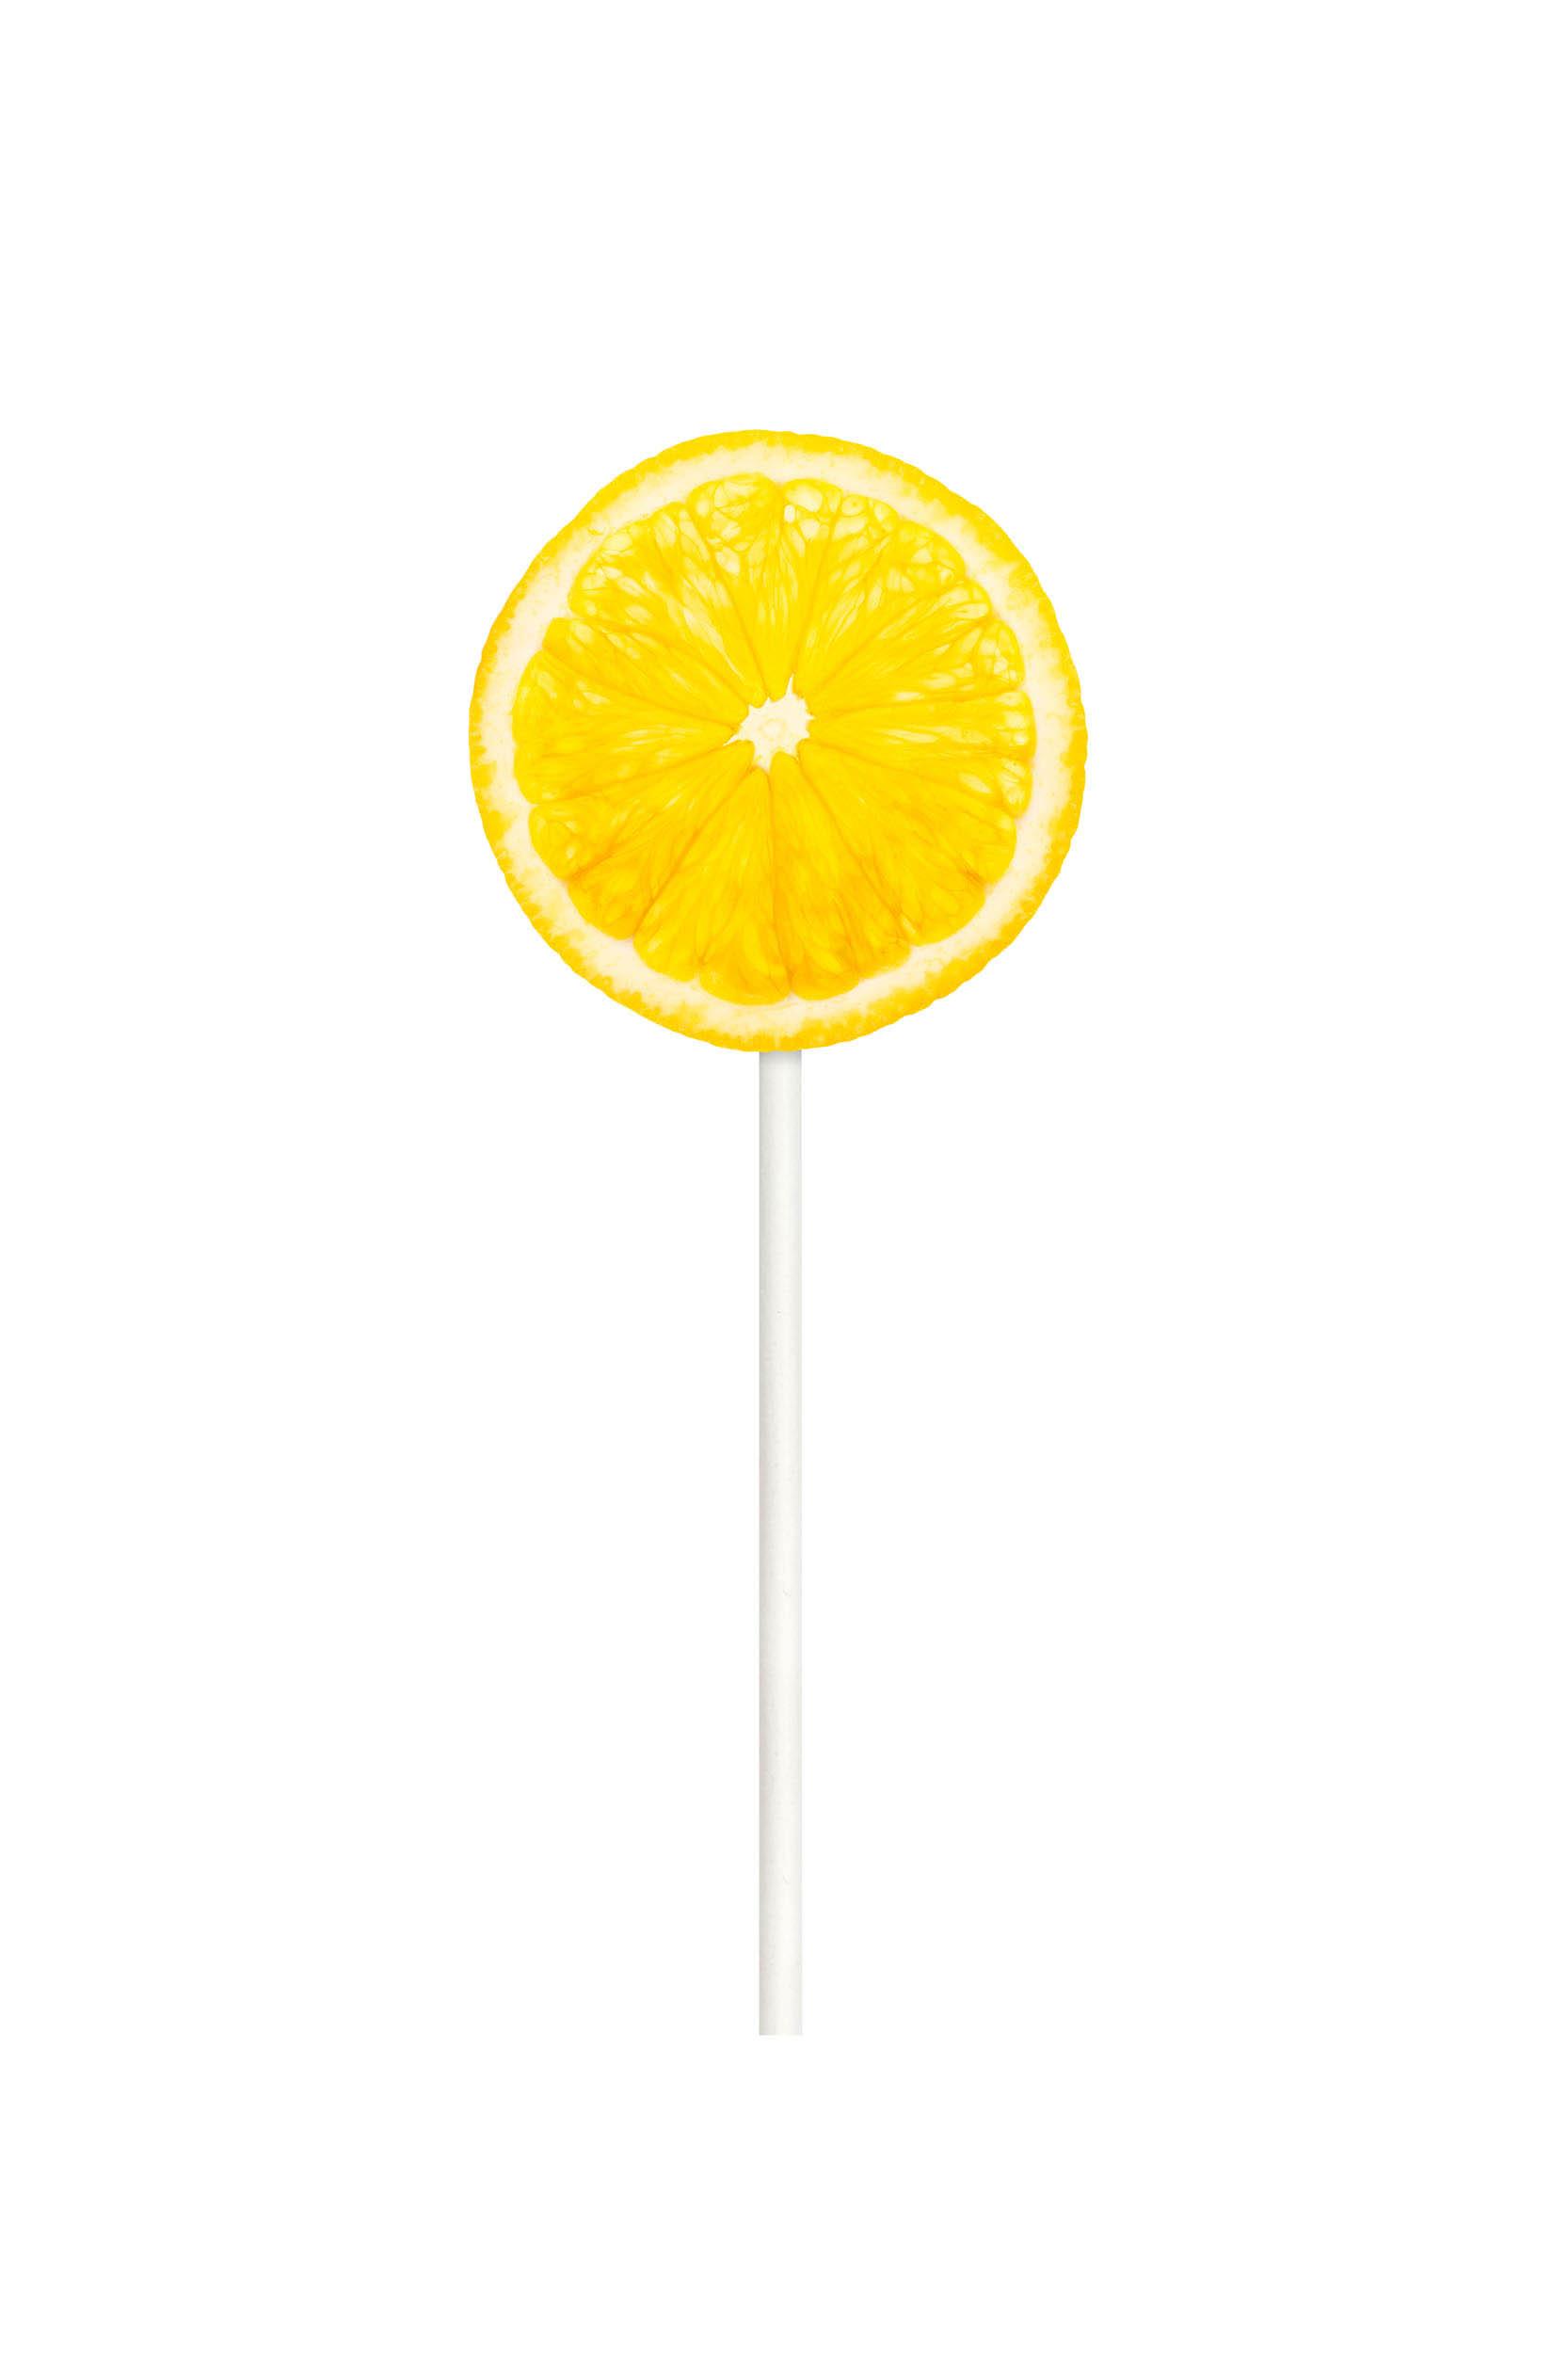 Lollipop-030.jpg